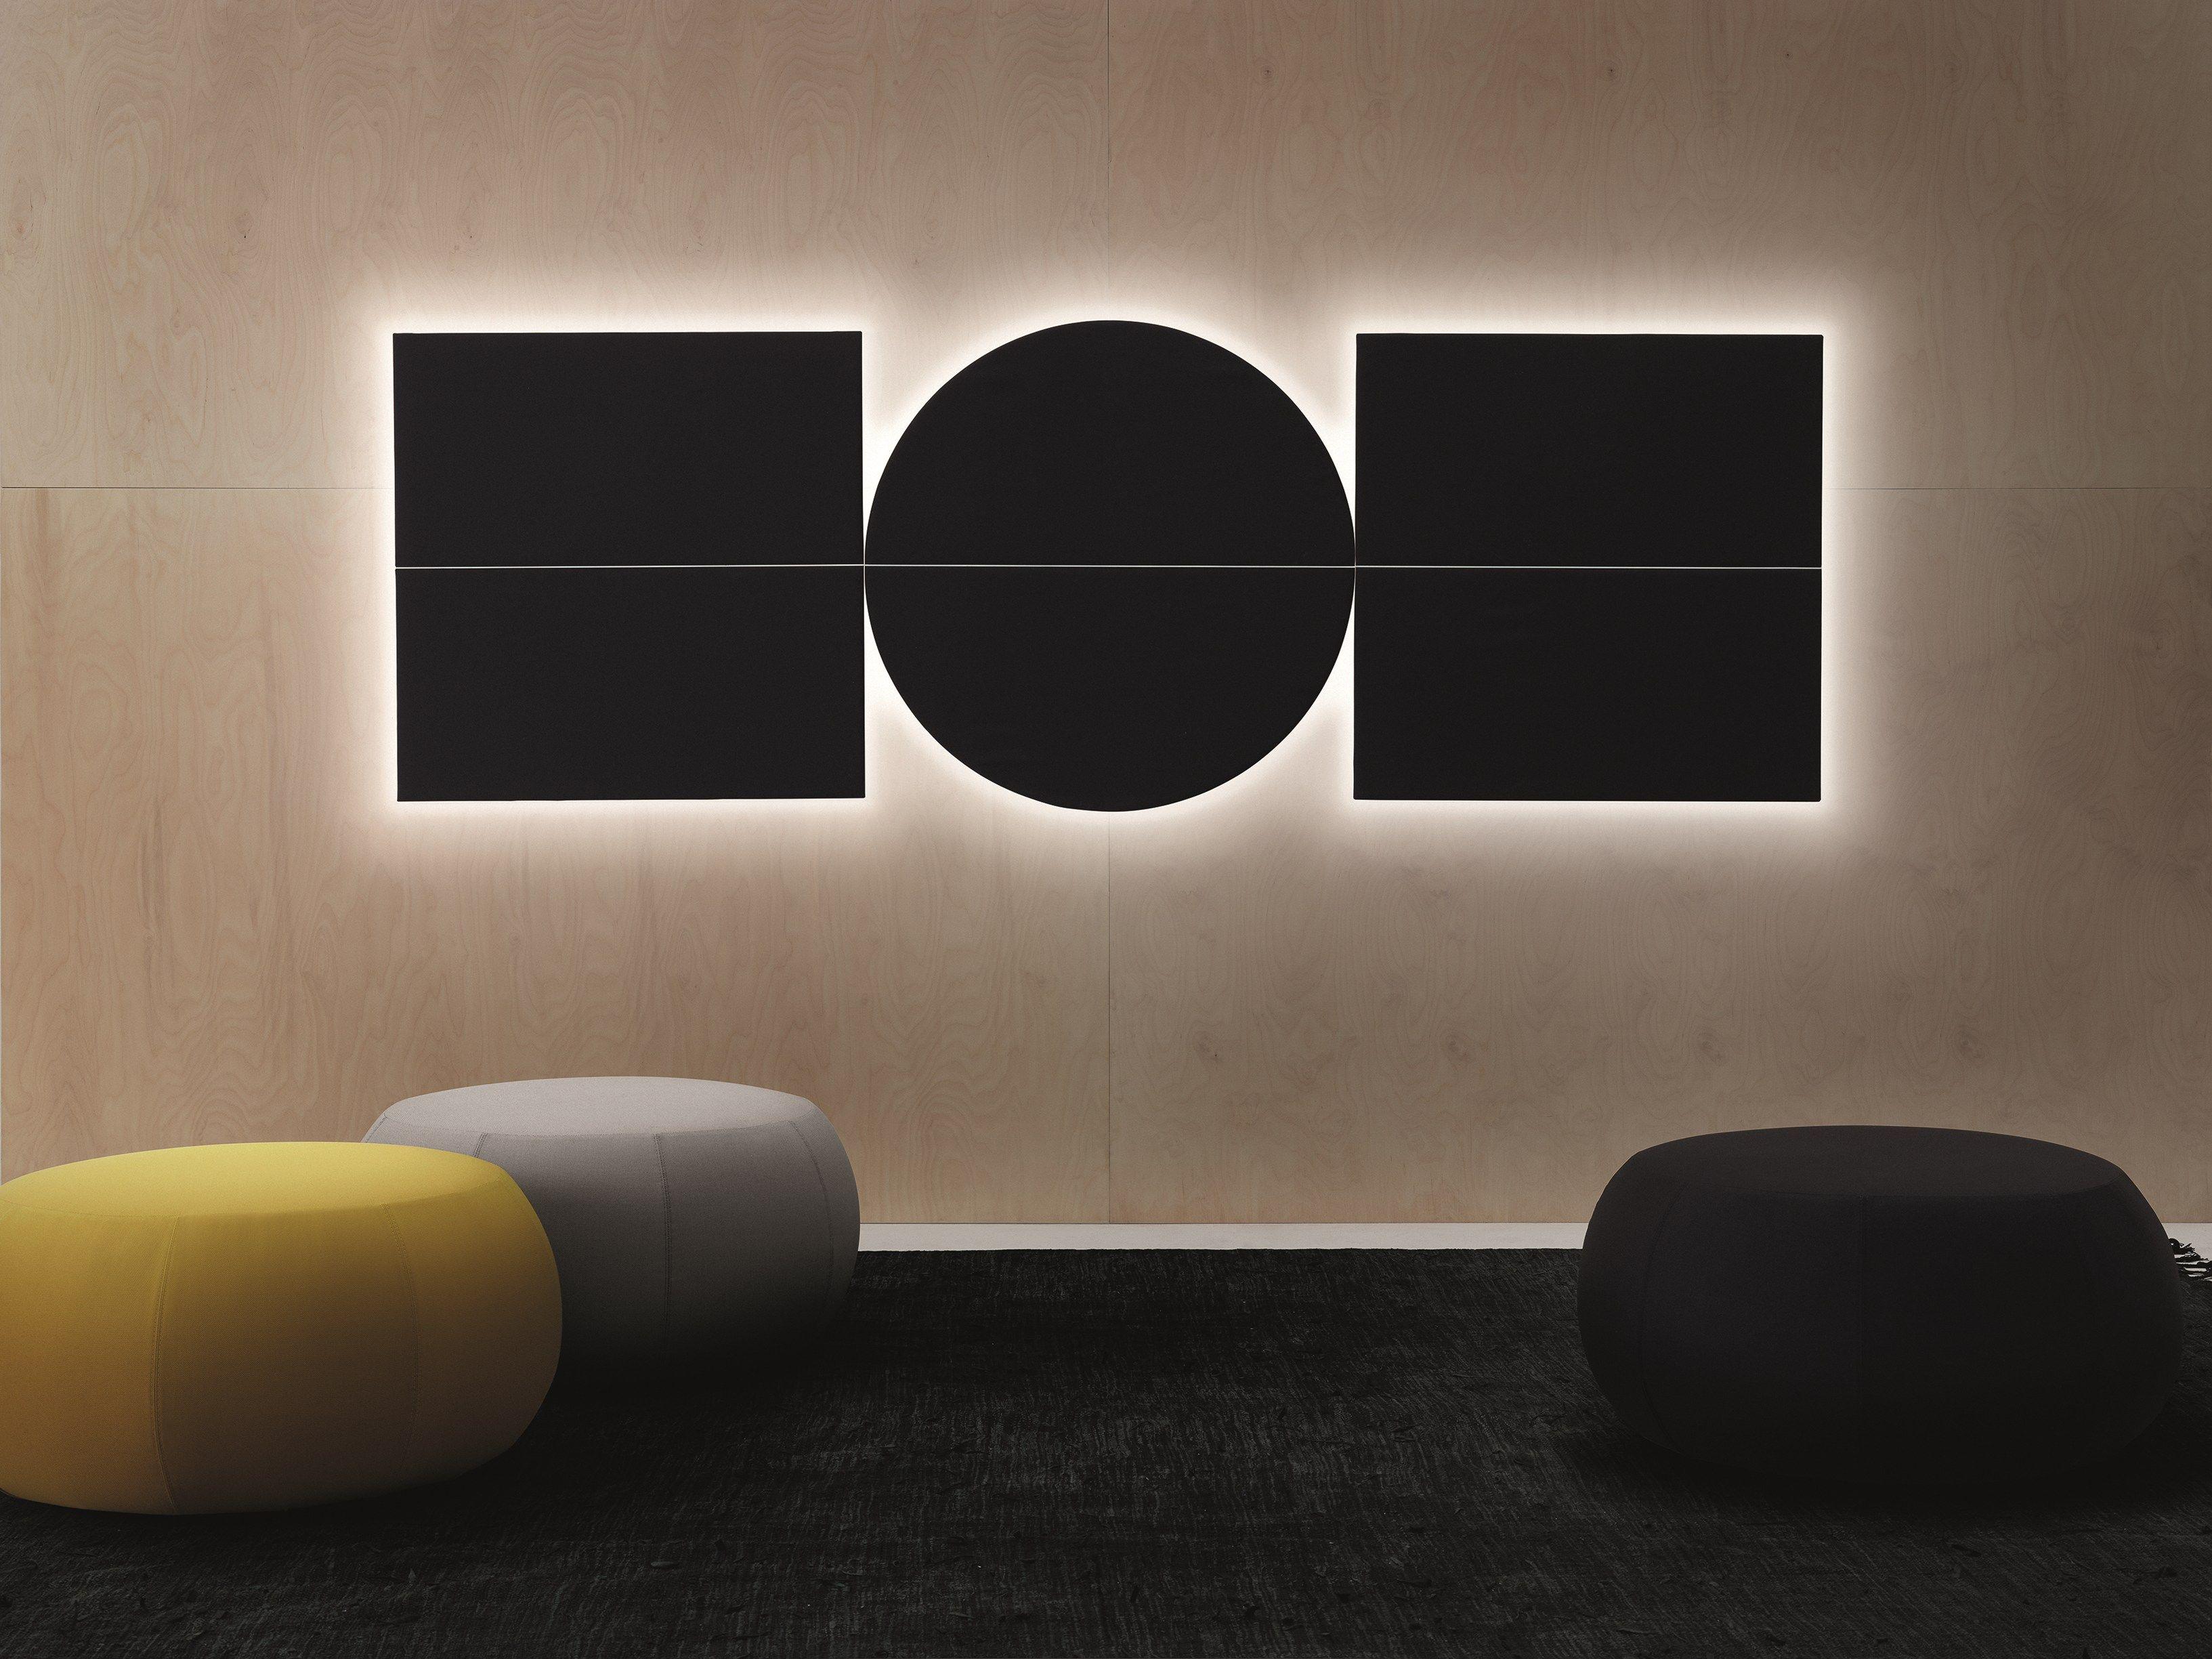 Decorative Acoustical Panels Parentesit By Arper Design Lievore Altherr Molina Acoustic Wall Panels Acoustic Wall Acoustic Panels